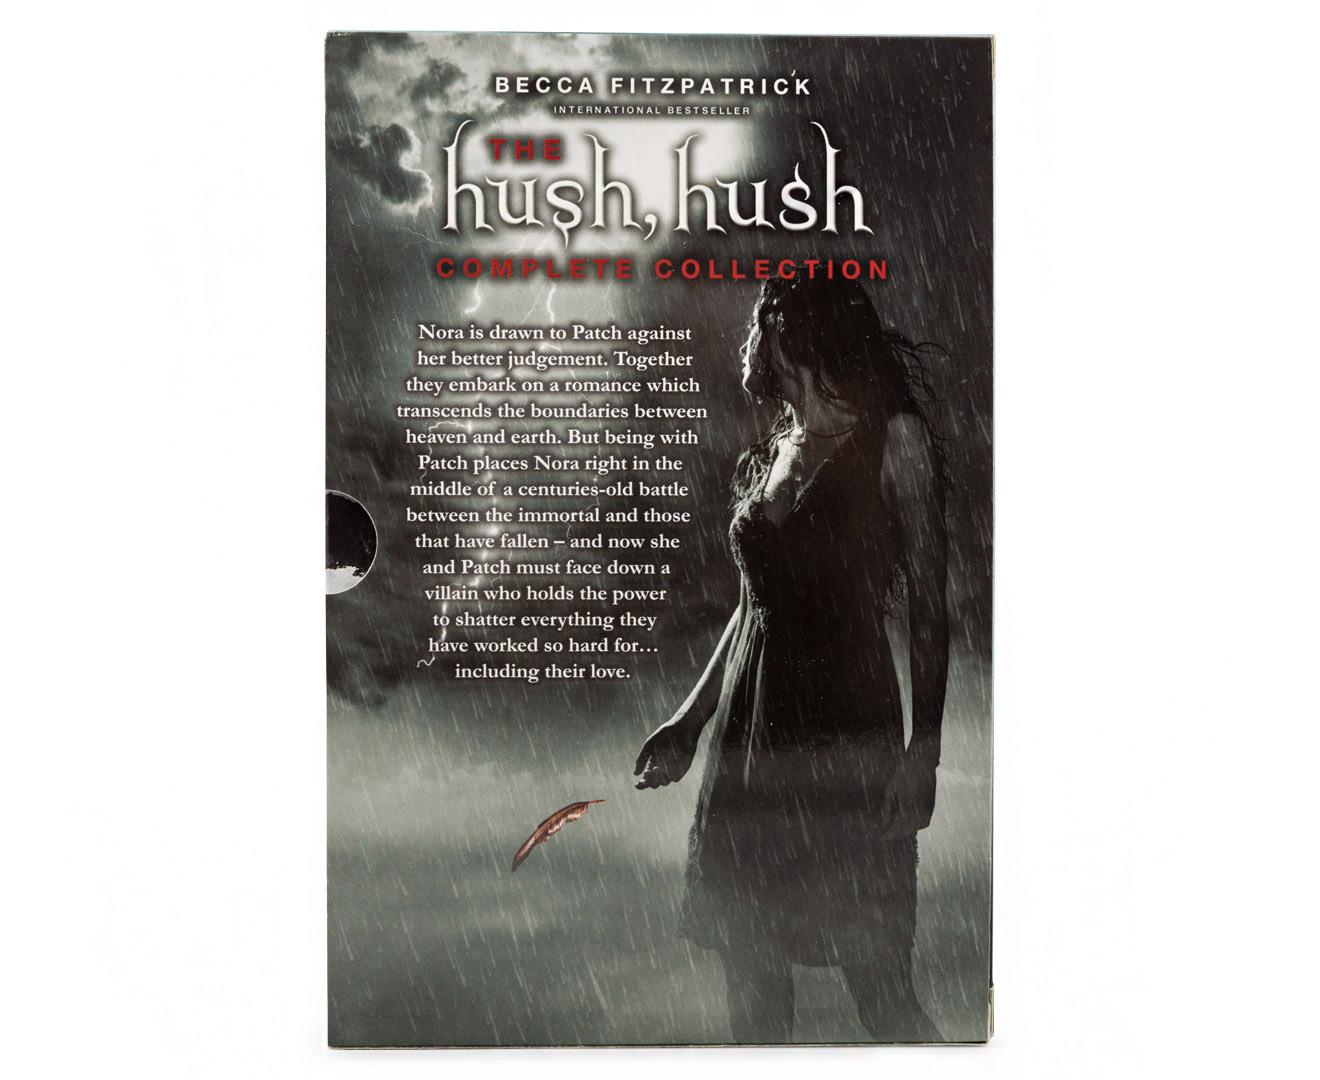 hush hush book online free pdf